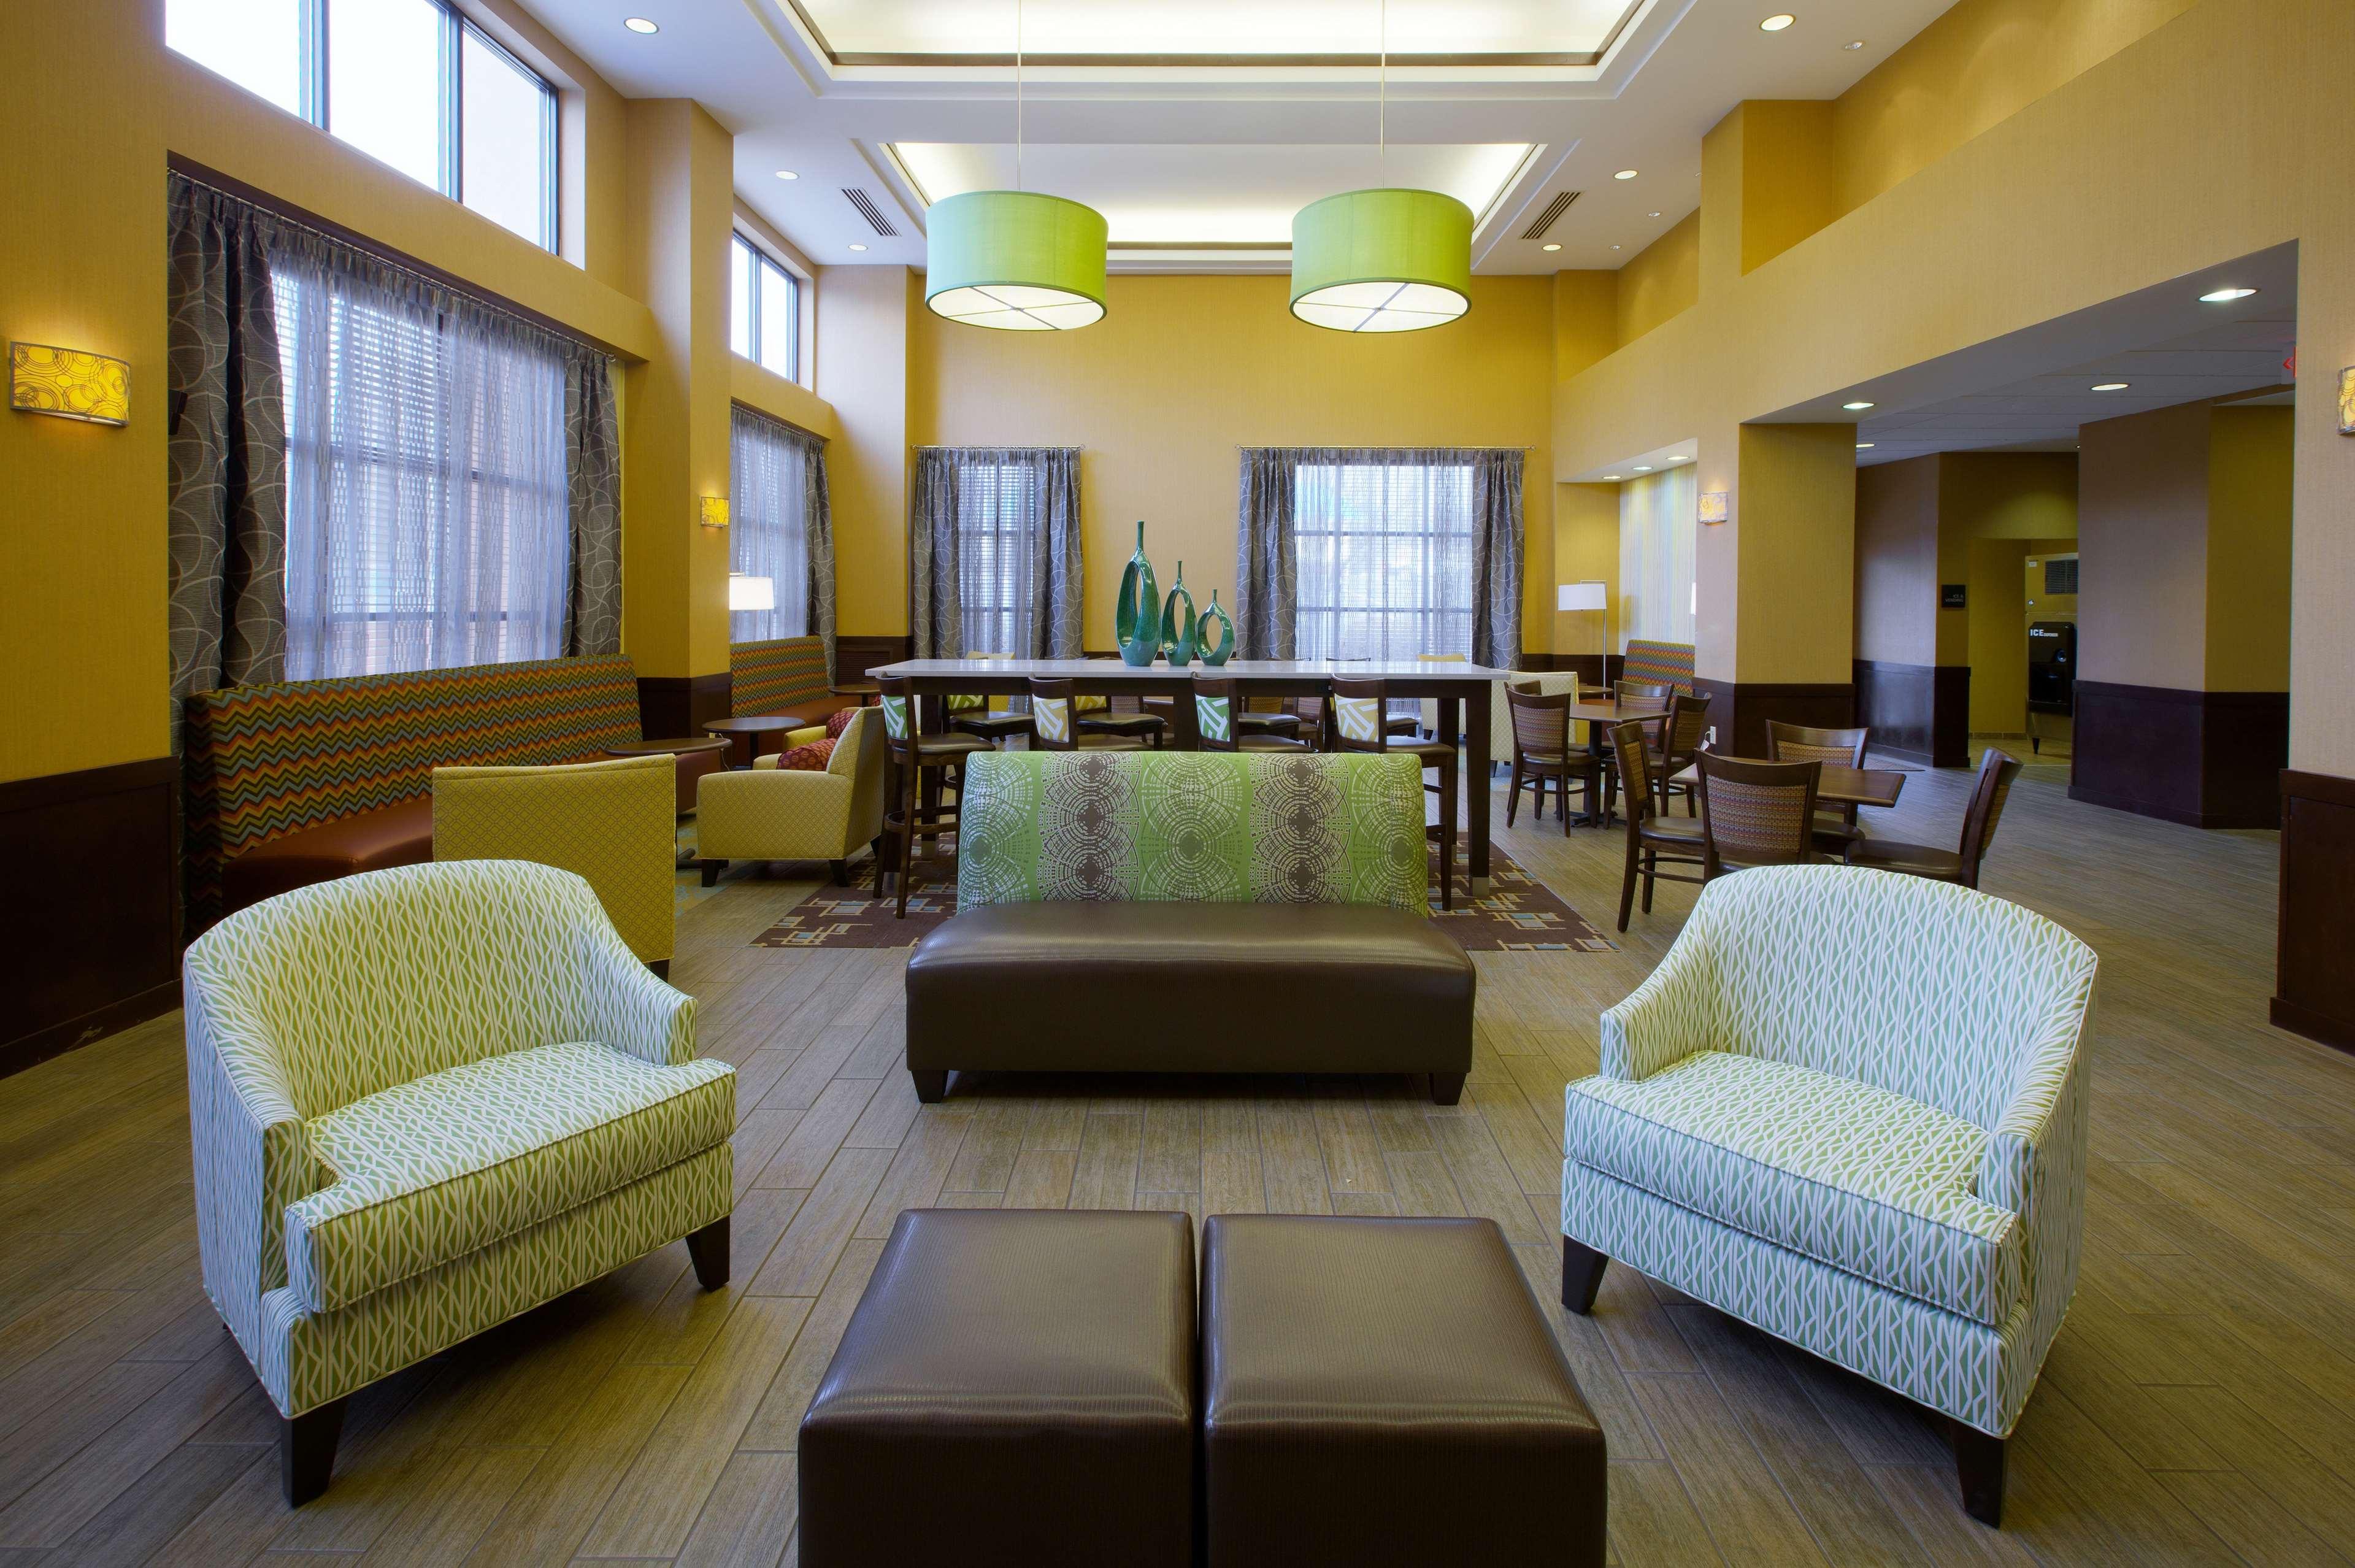 Hampton Inn & Suites Burlington image 0